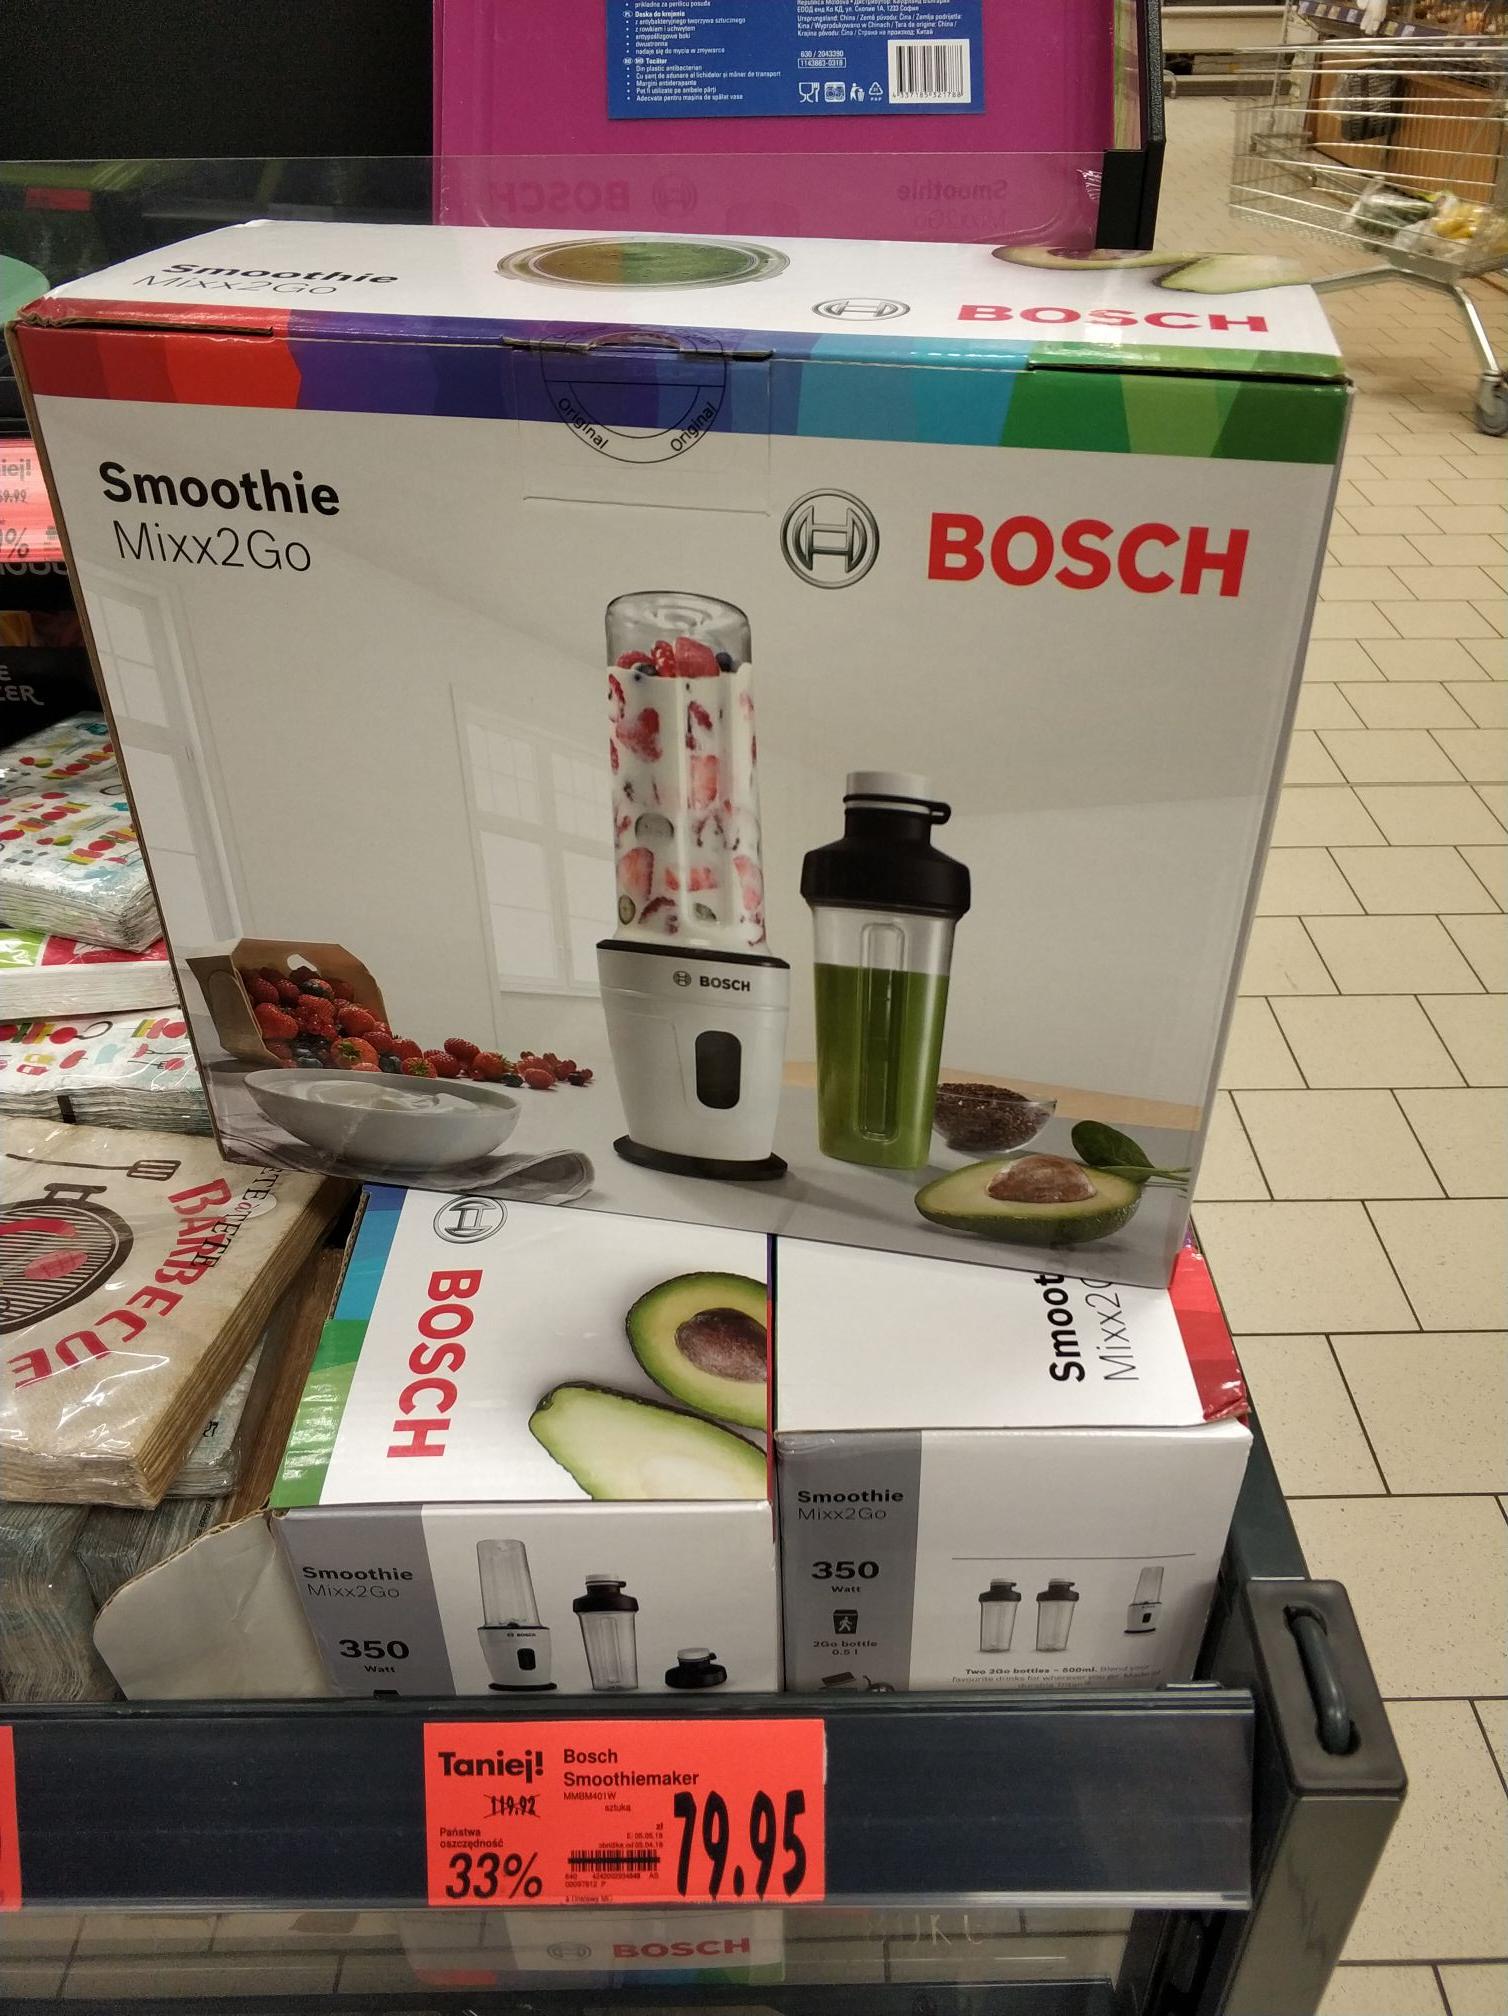 Bosch Smoothiemaker